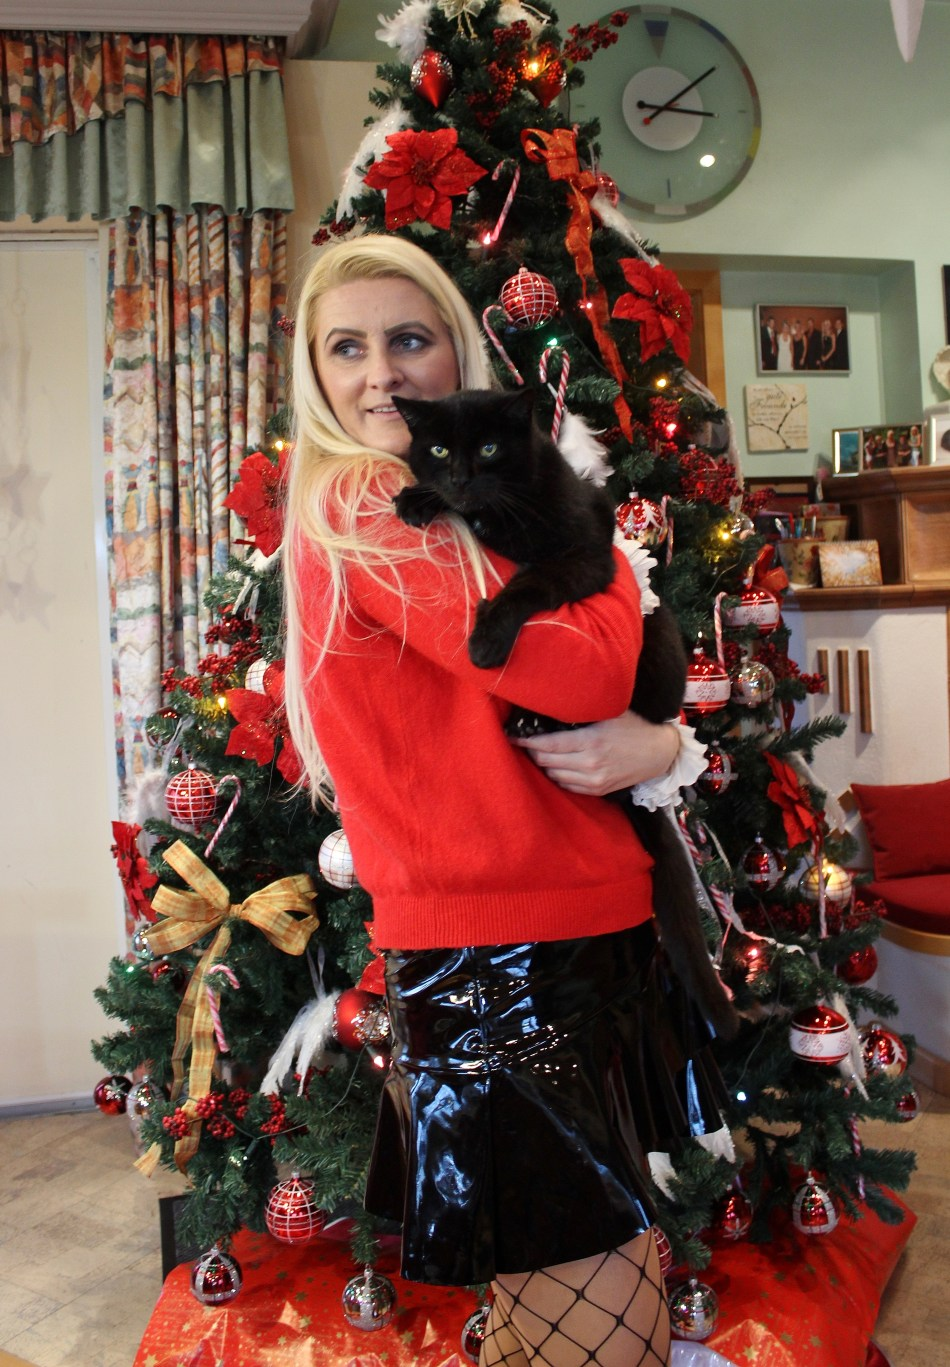 Christmas-Tree-Cookies-Red-Vinyl-Patent-Leather-Skirt-fishnet-Stockings-Decor-carrieslifestyle-Tamara-Prutsch